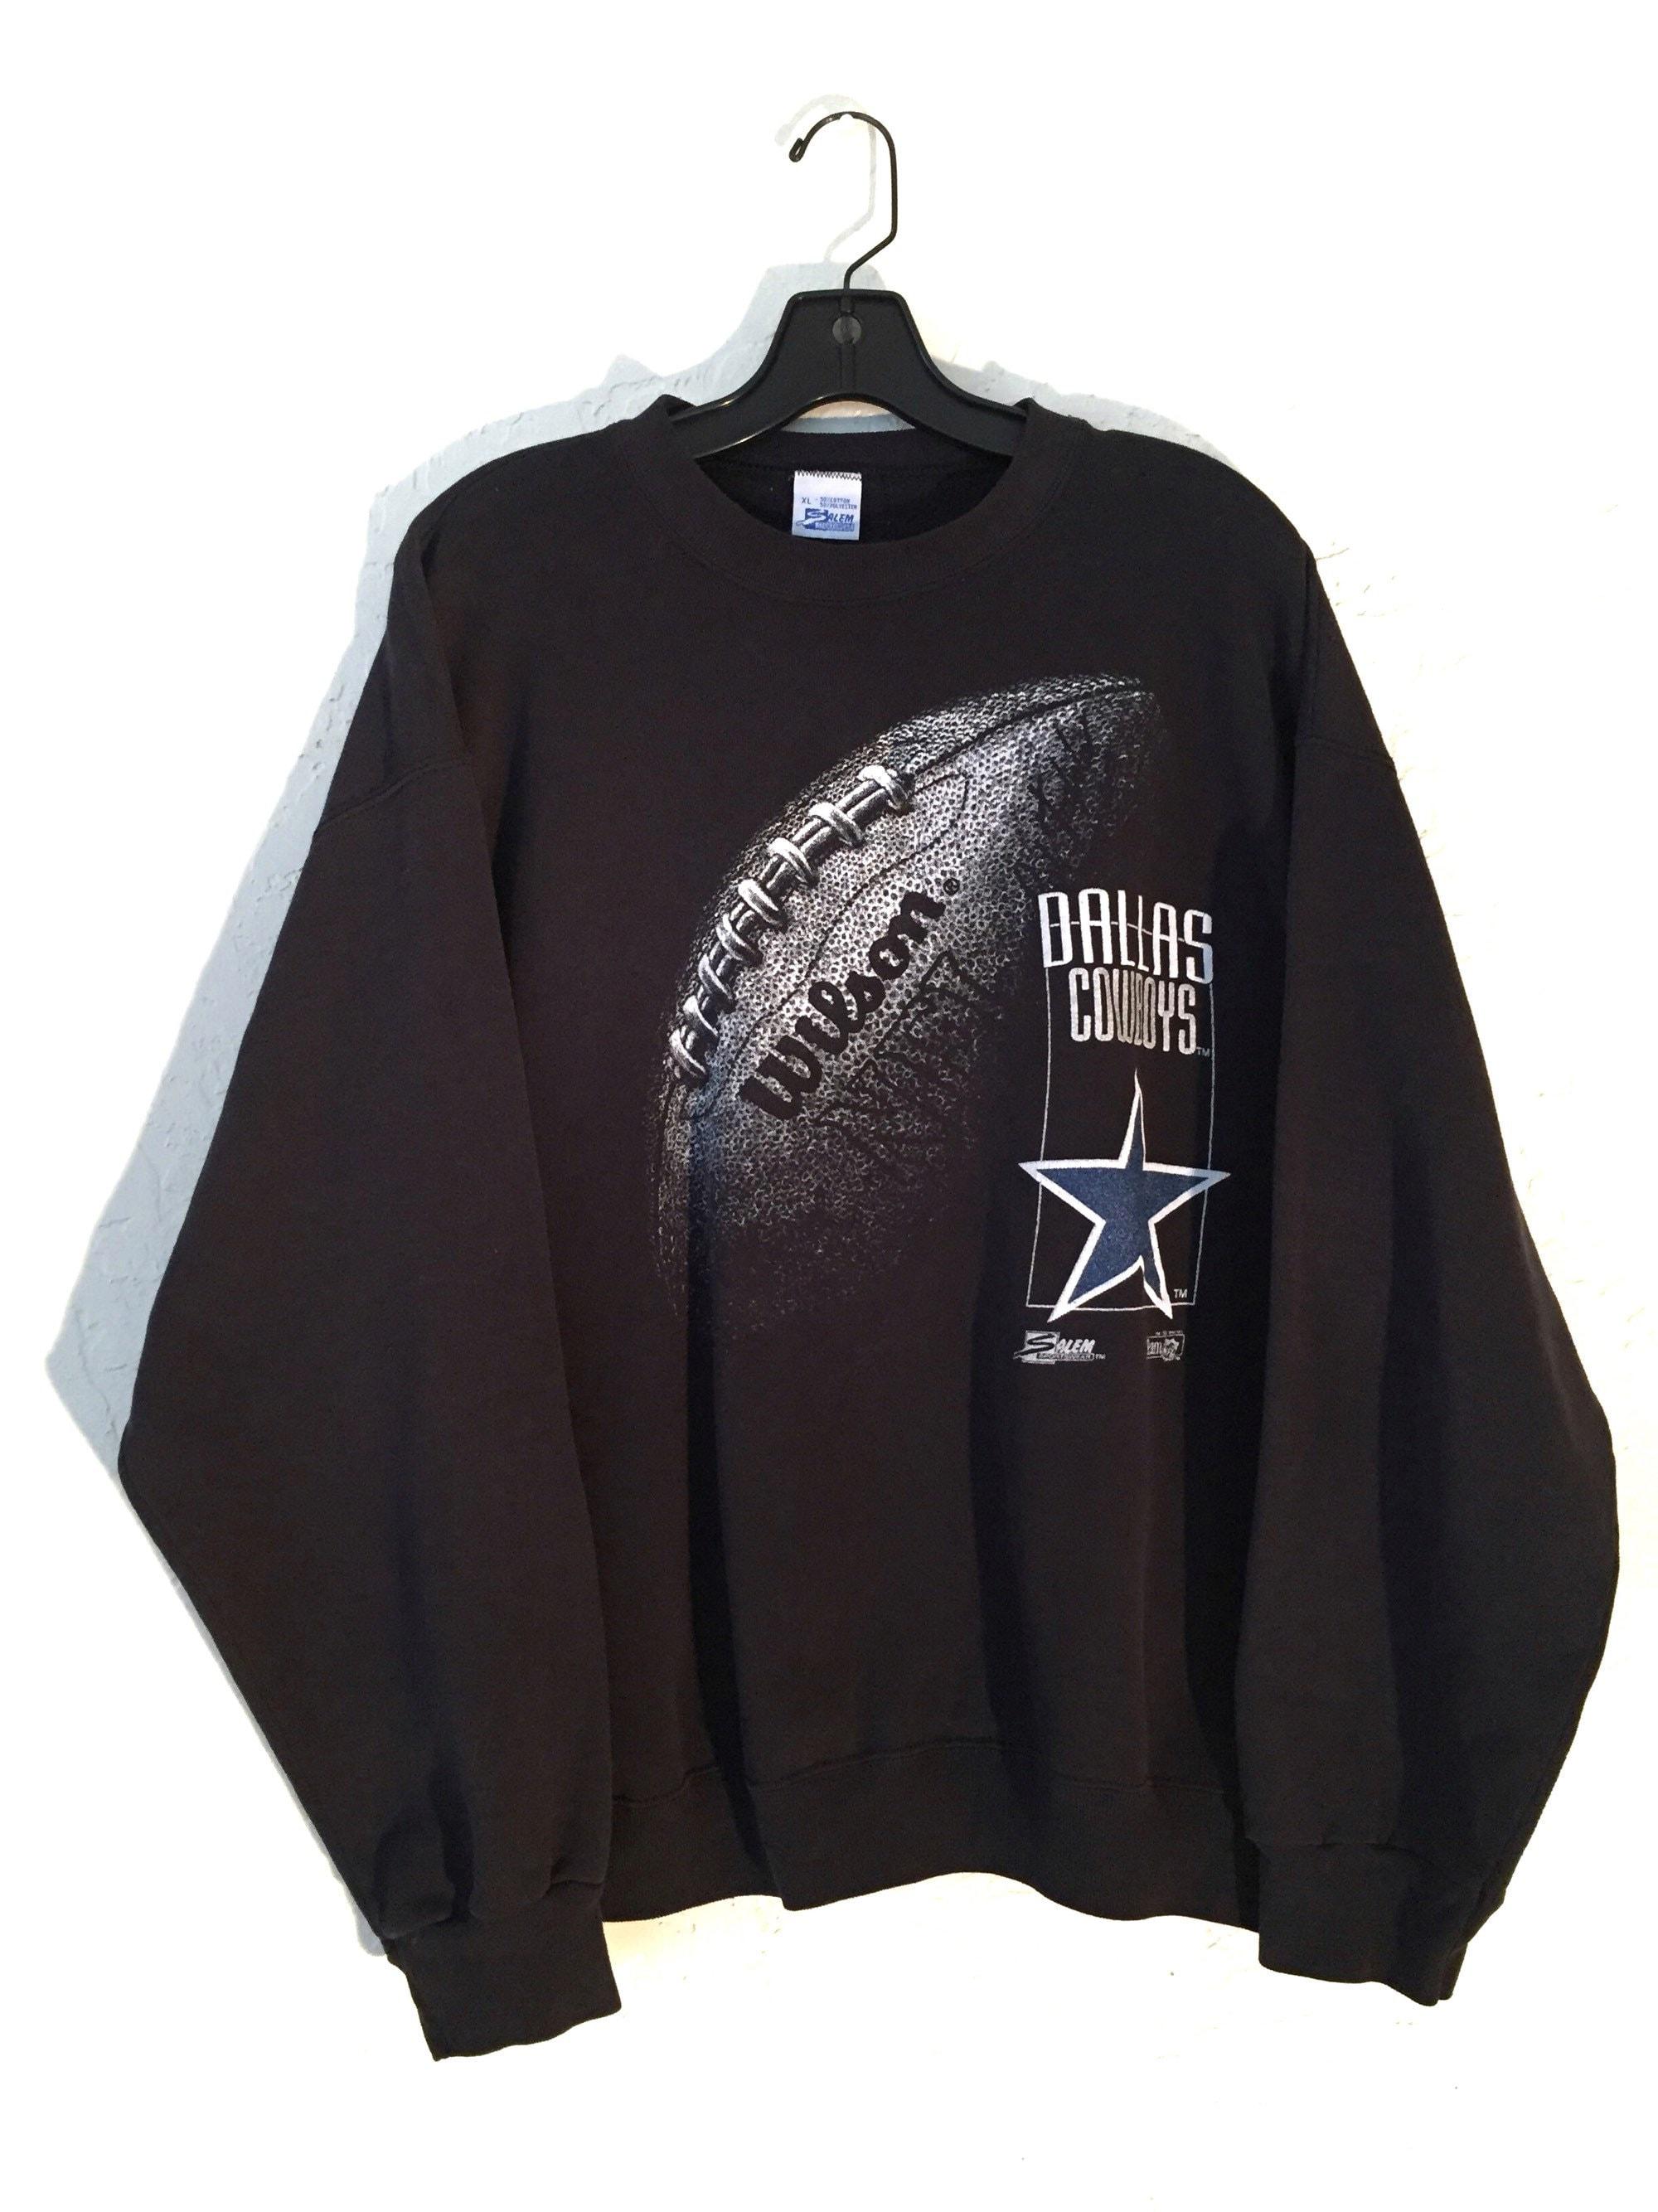 New 90s Vintage NFL Dallas Cowboys Big Logo Black, White and Blue  supplier